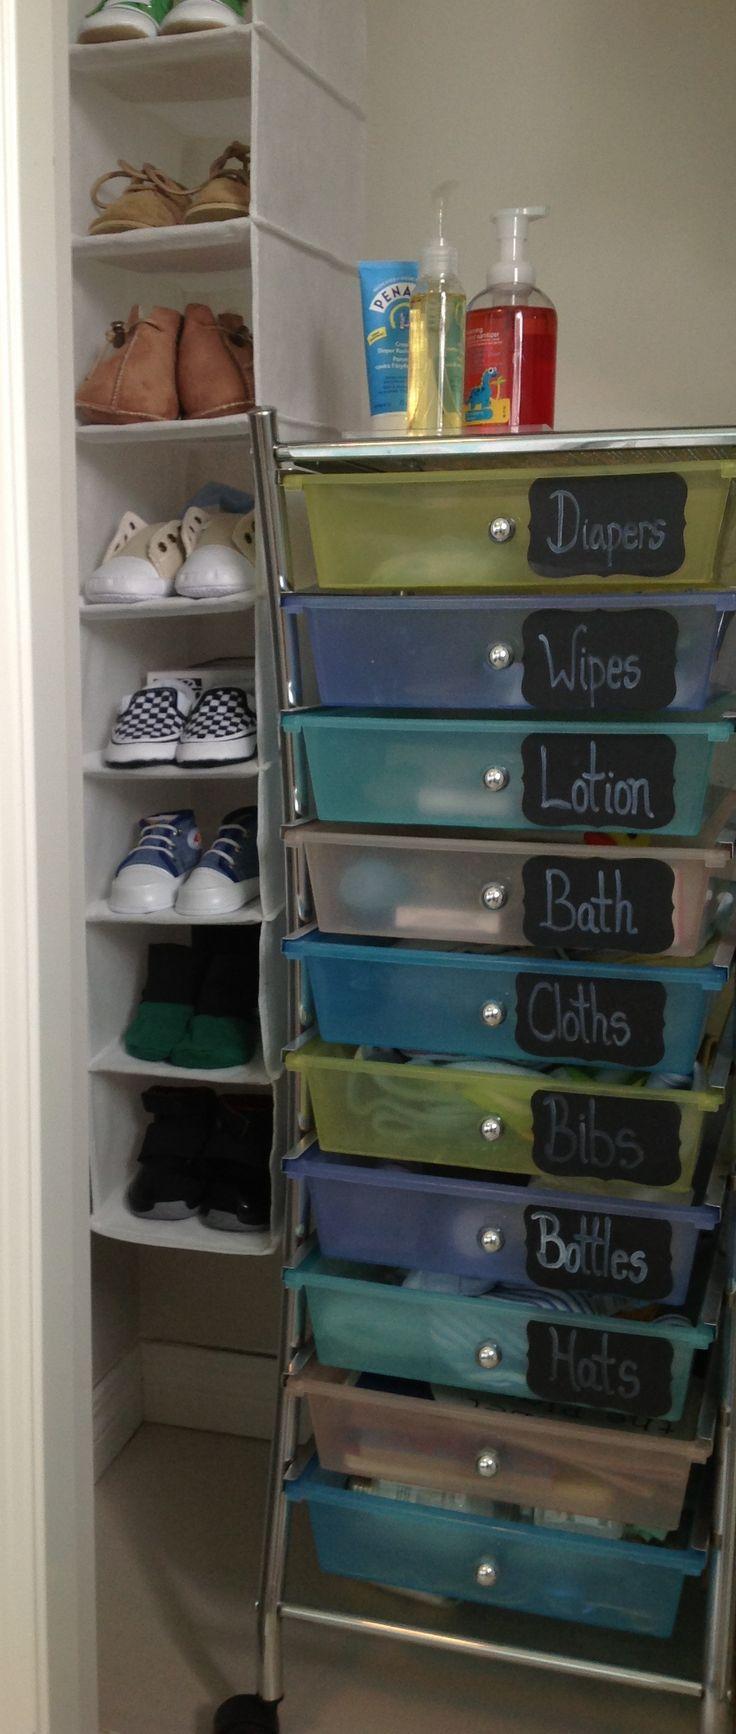 Nursery organization. Cart from Costco. Martha Stewart labels from Staples. Brides chalk pen from Michaels.  Shoe organizer from Walmart.